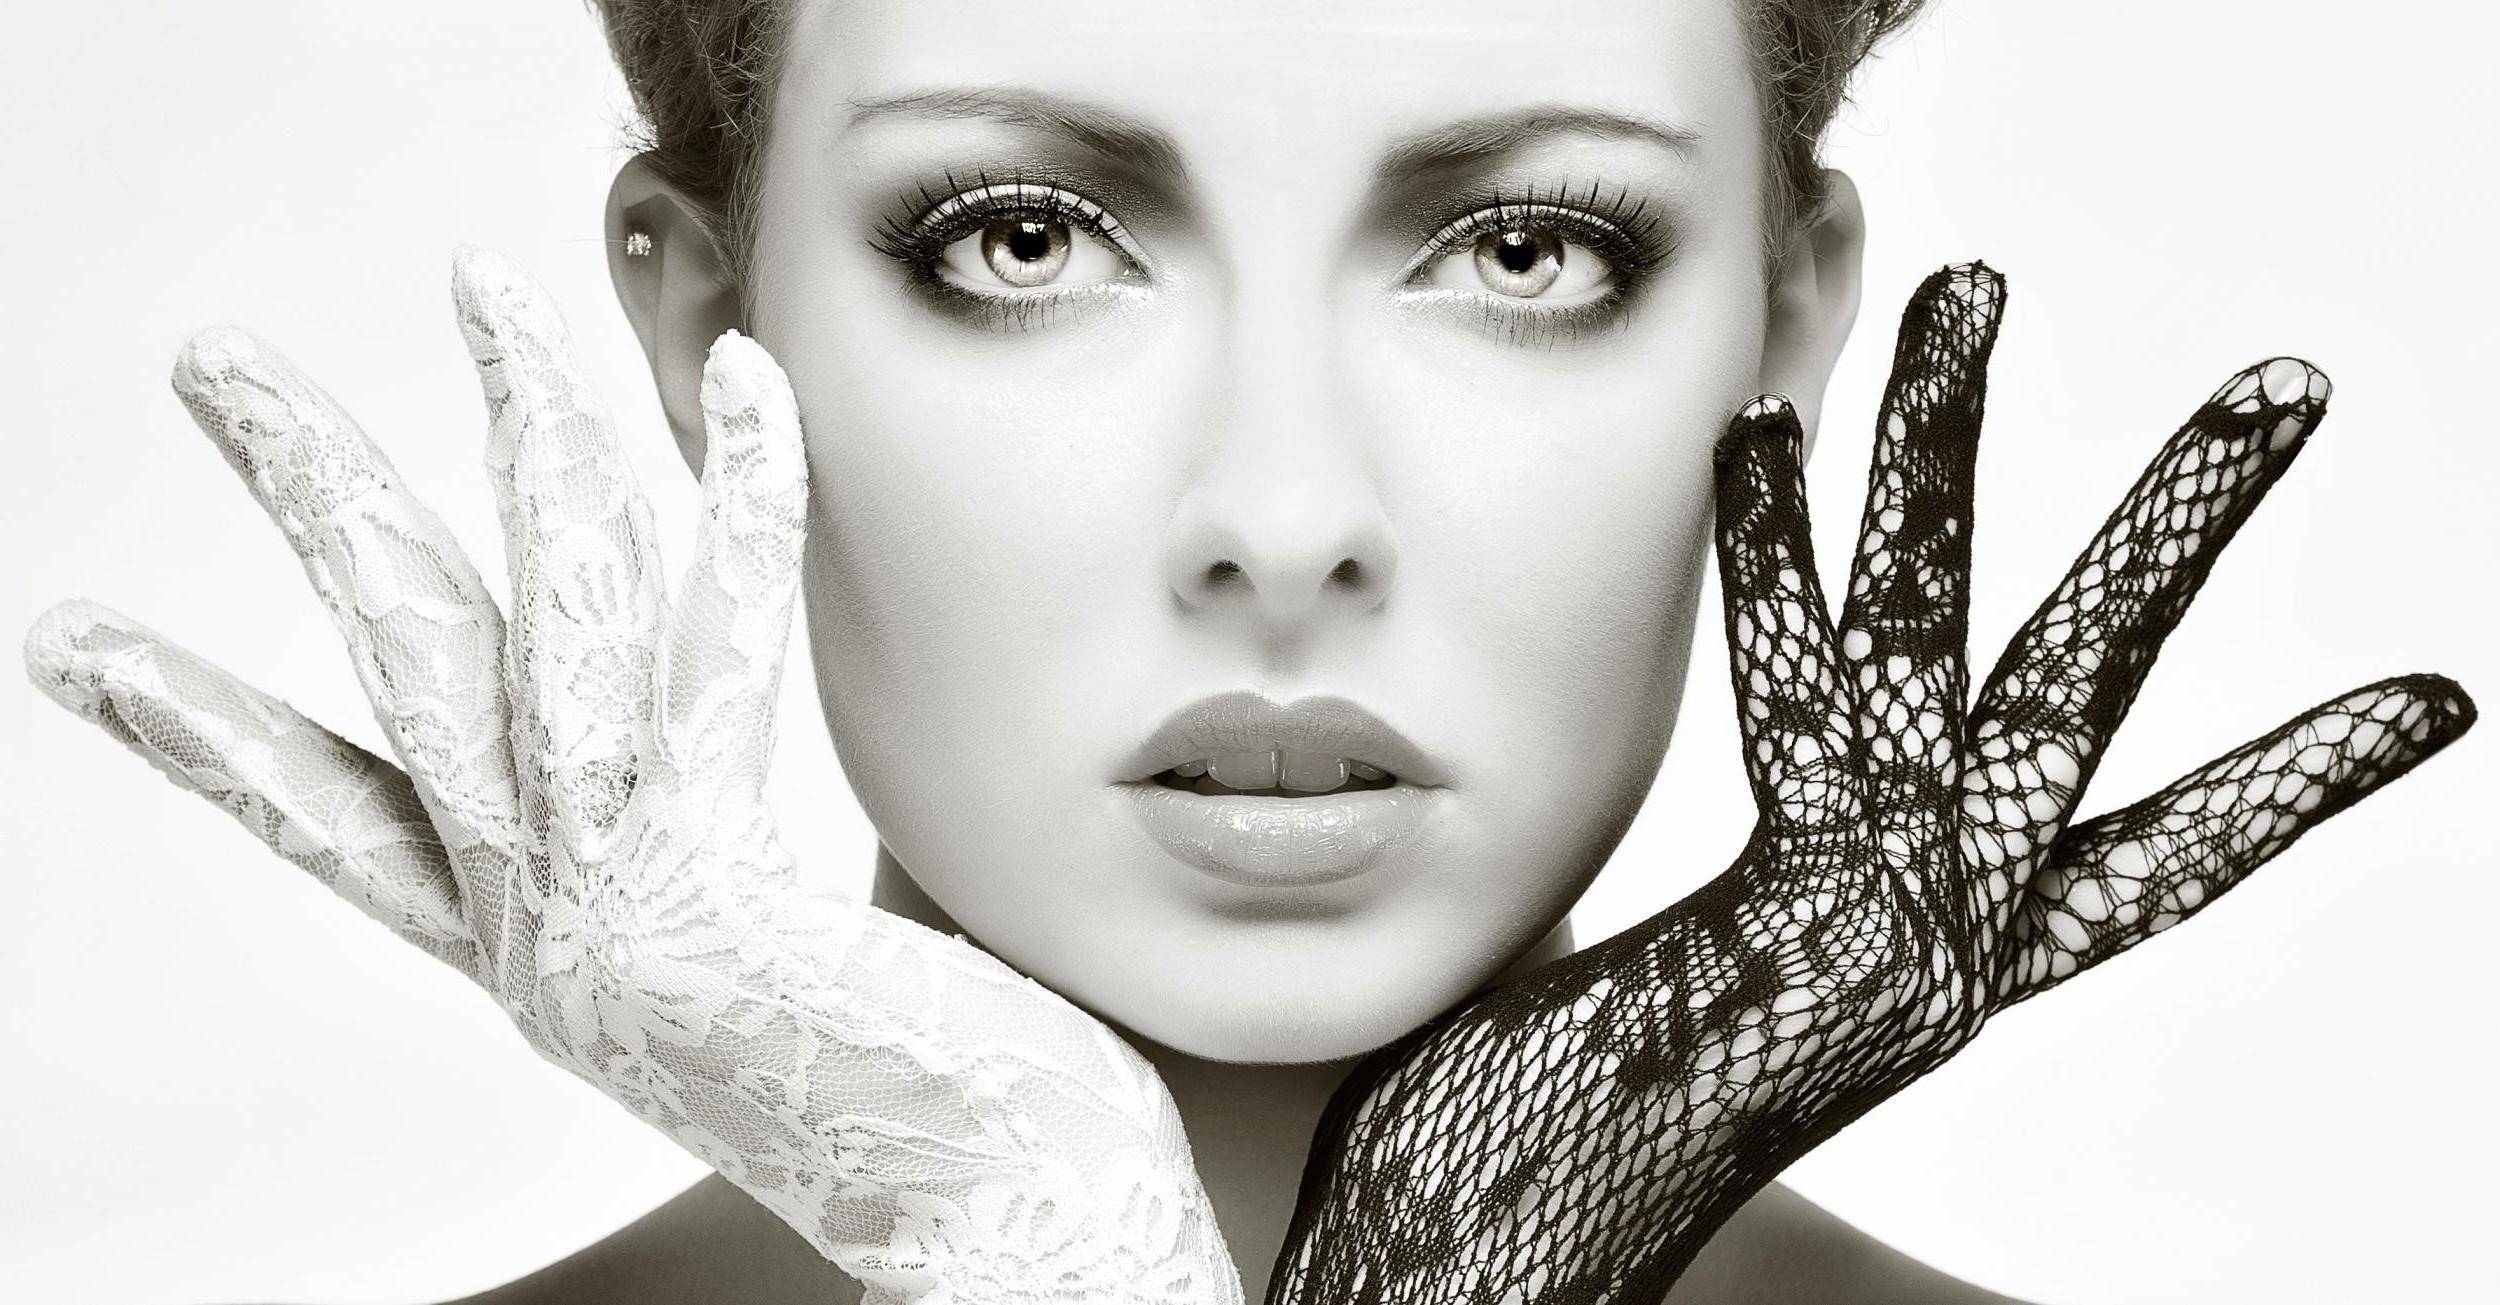 Wallpaper Face Women Model Black Background Looking: Wallpaper : Face, Drawing, Women, Model, Looking At Viewer